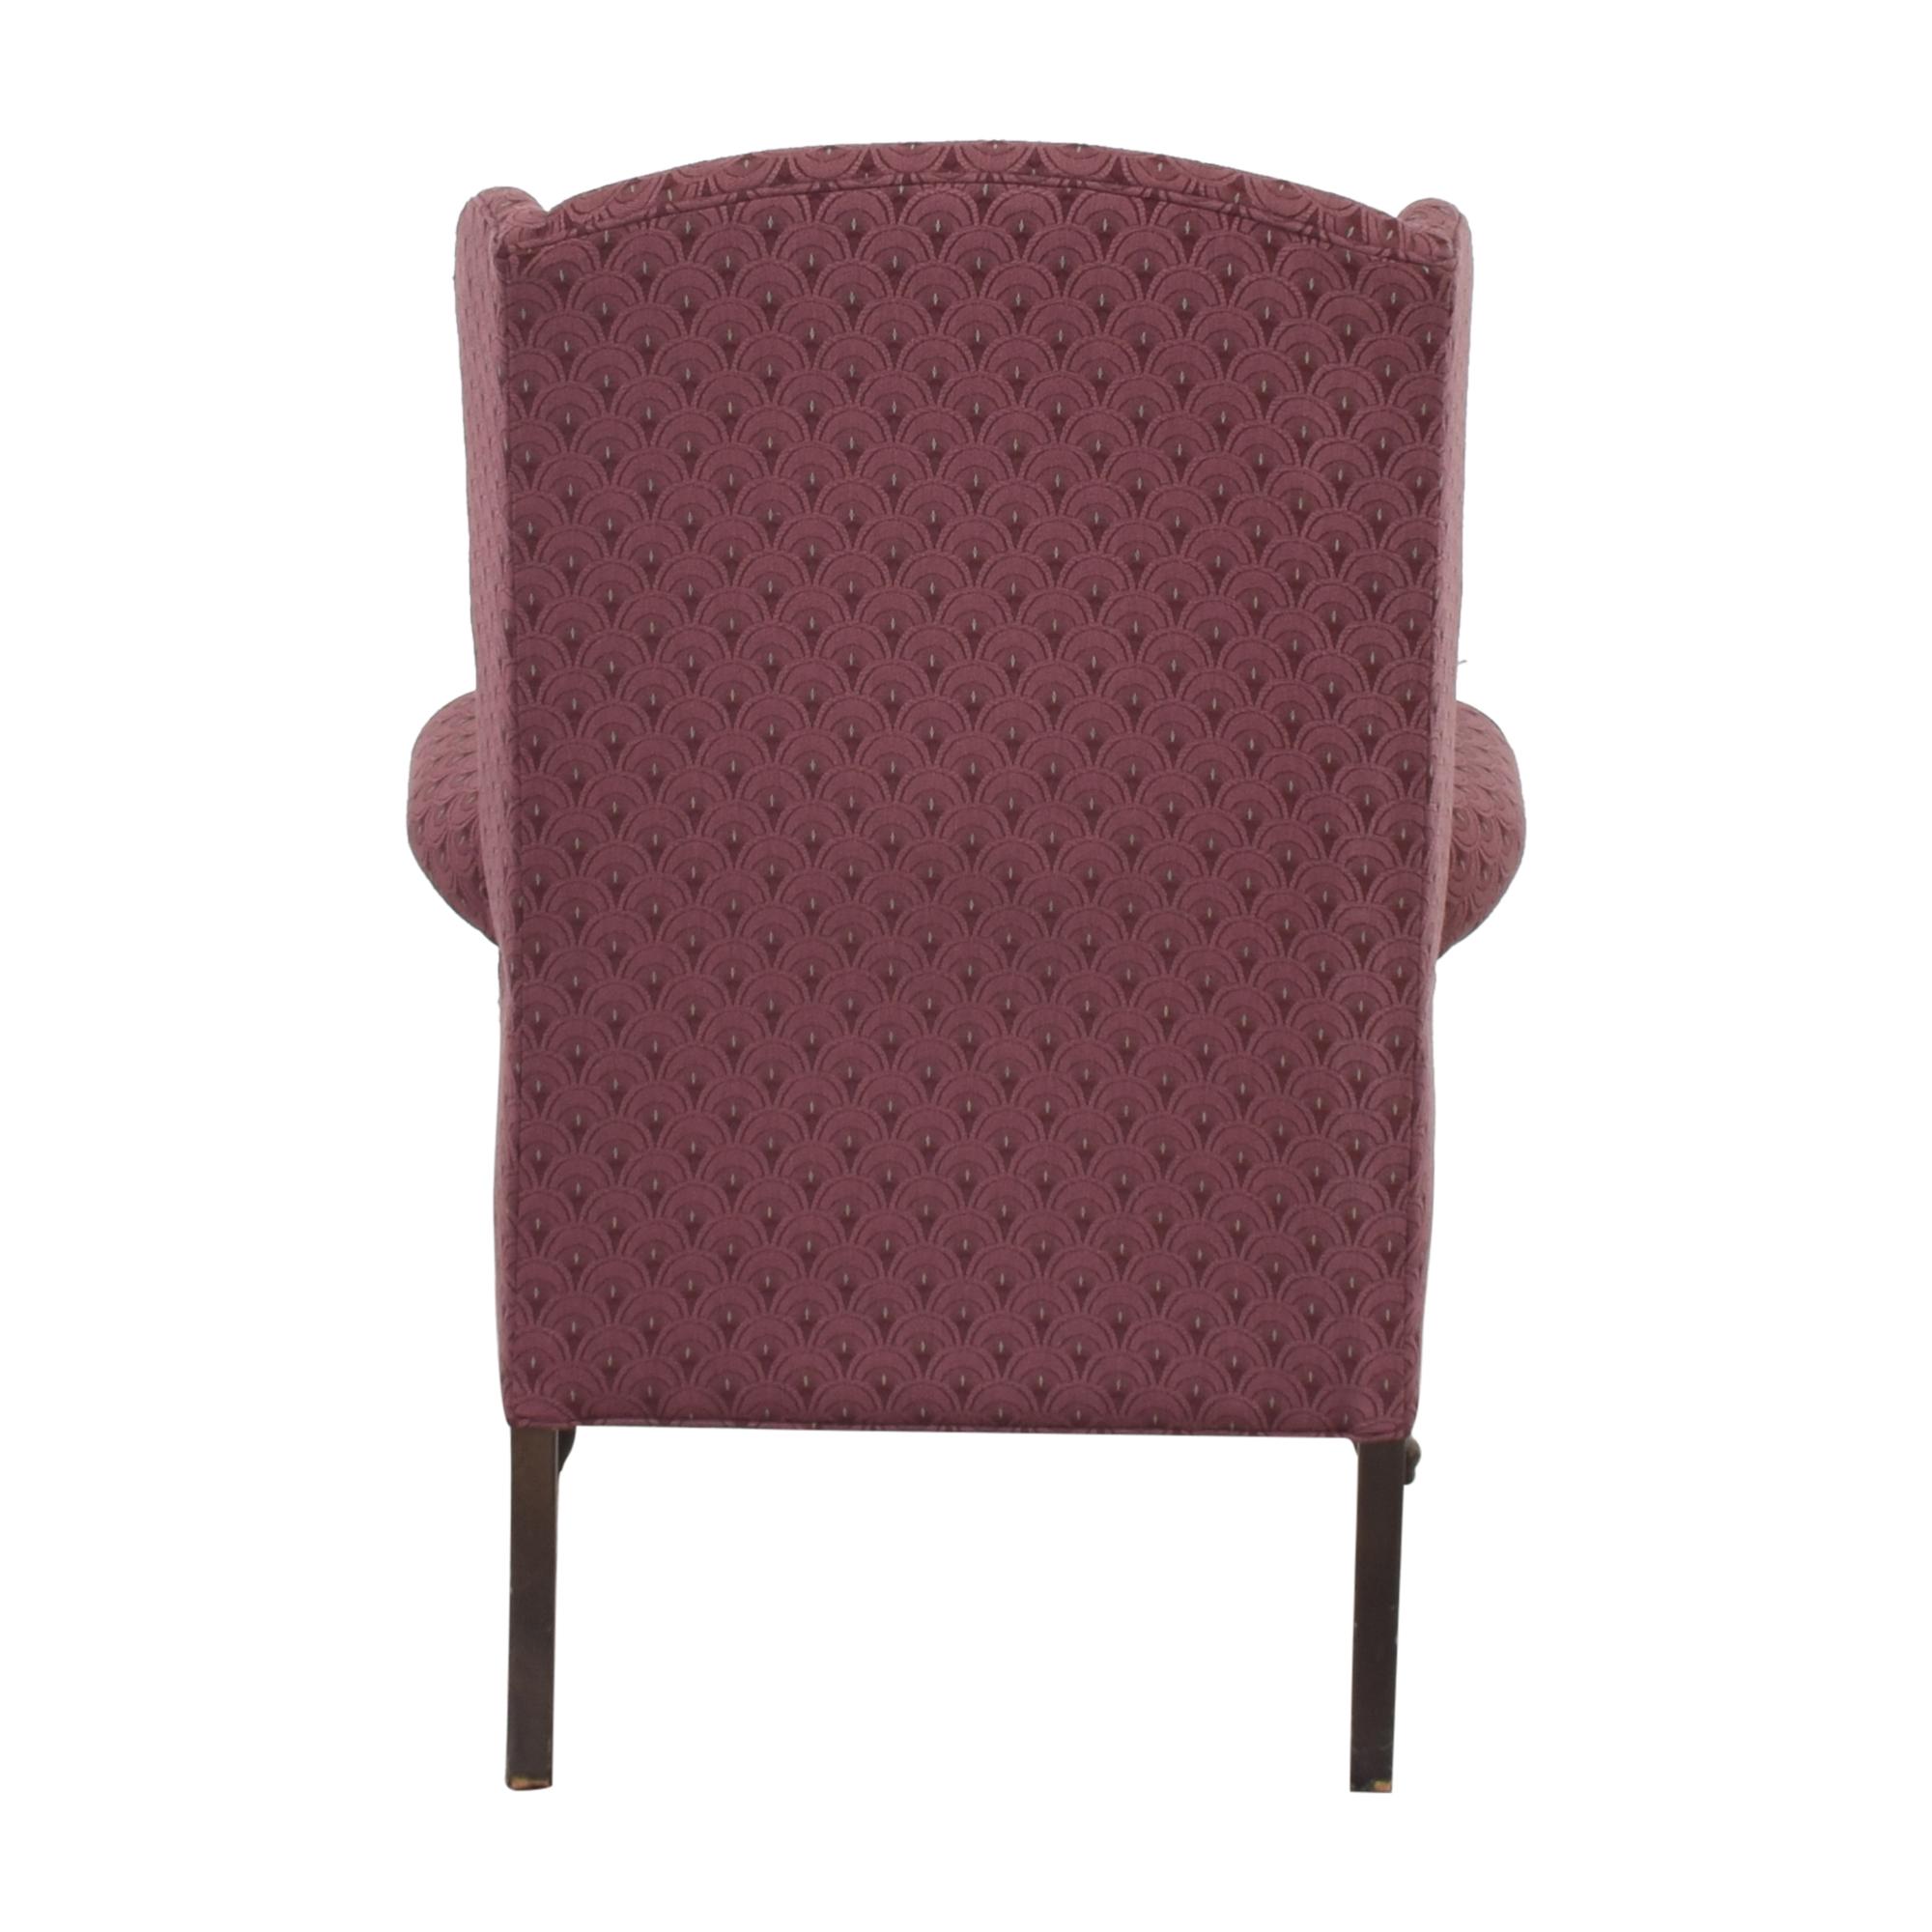 Pembrook Chair Pembrook Wing Accent Chair discount